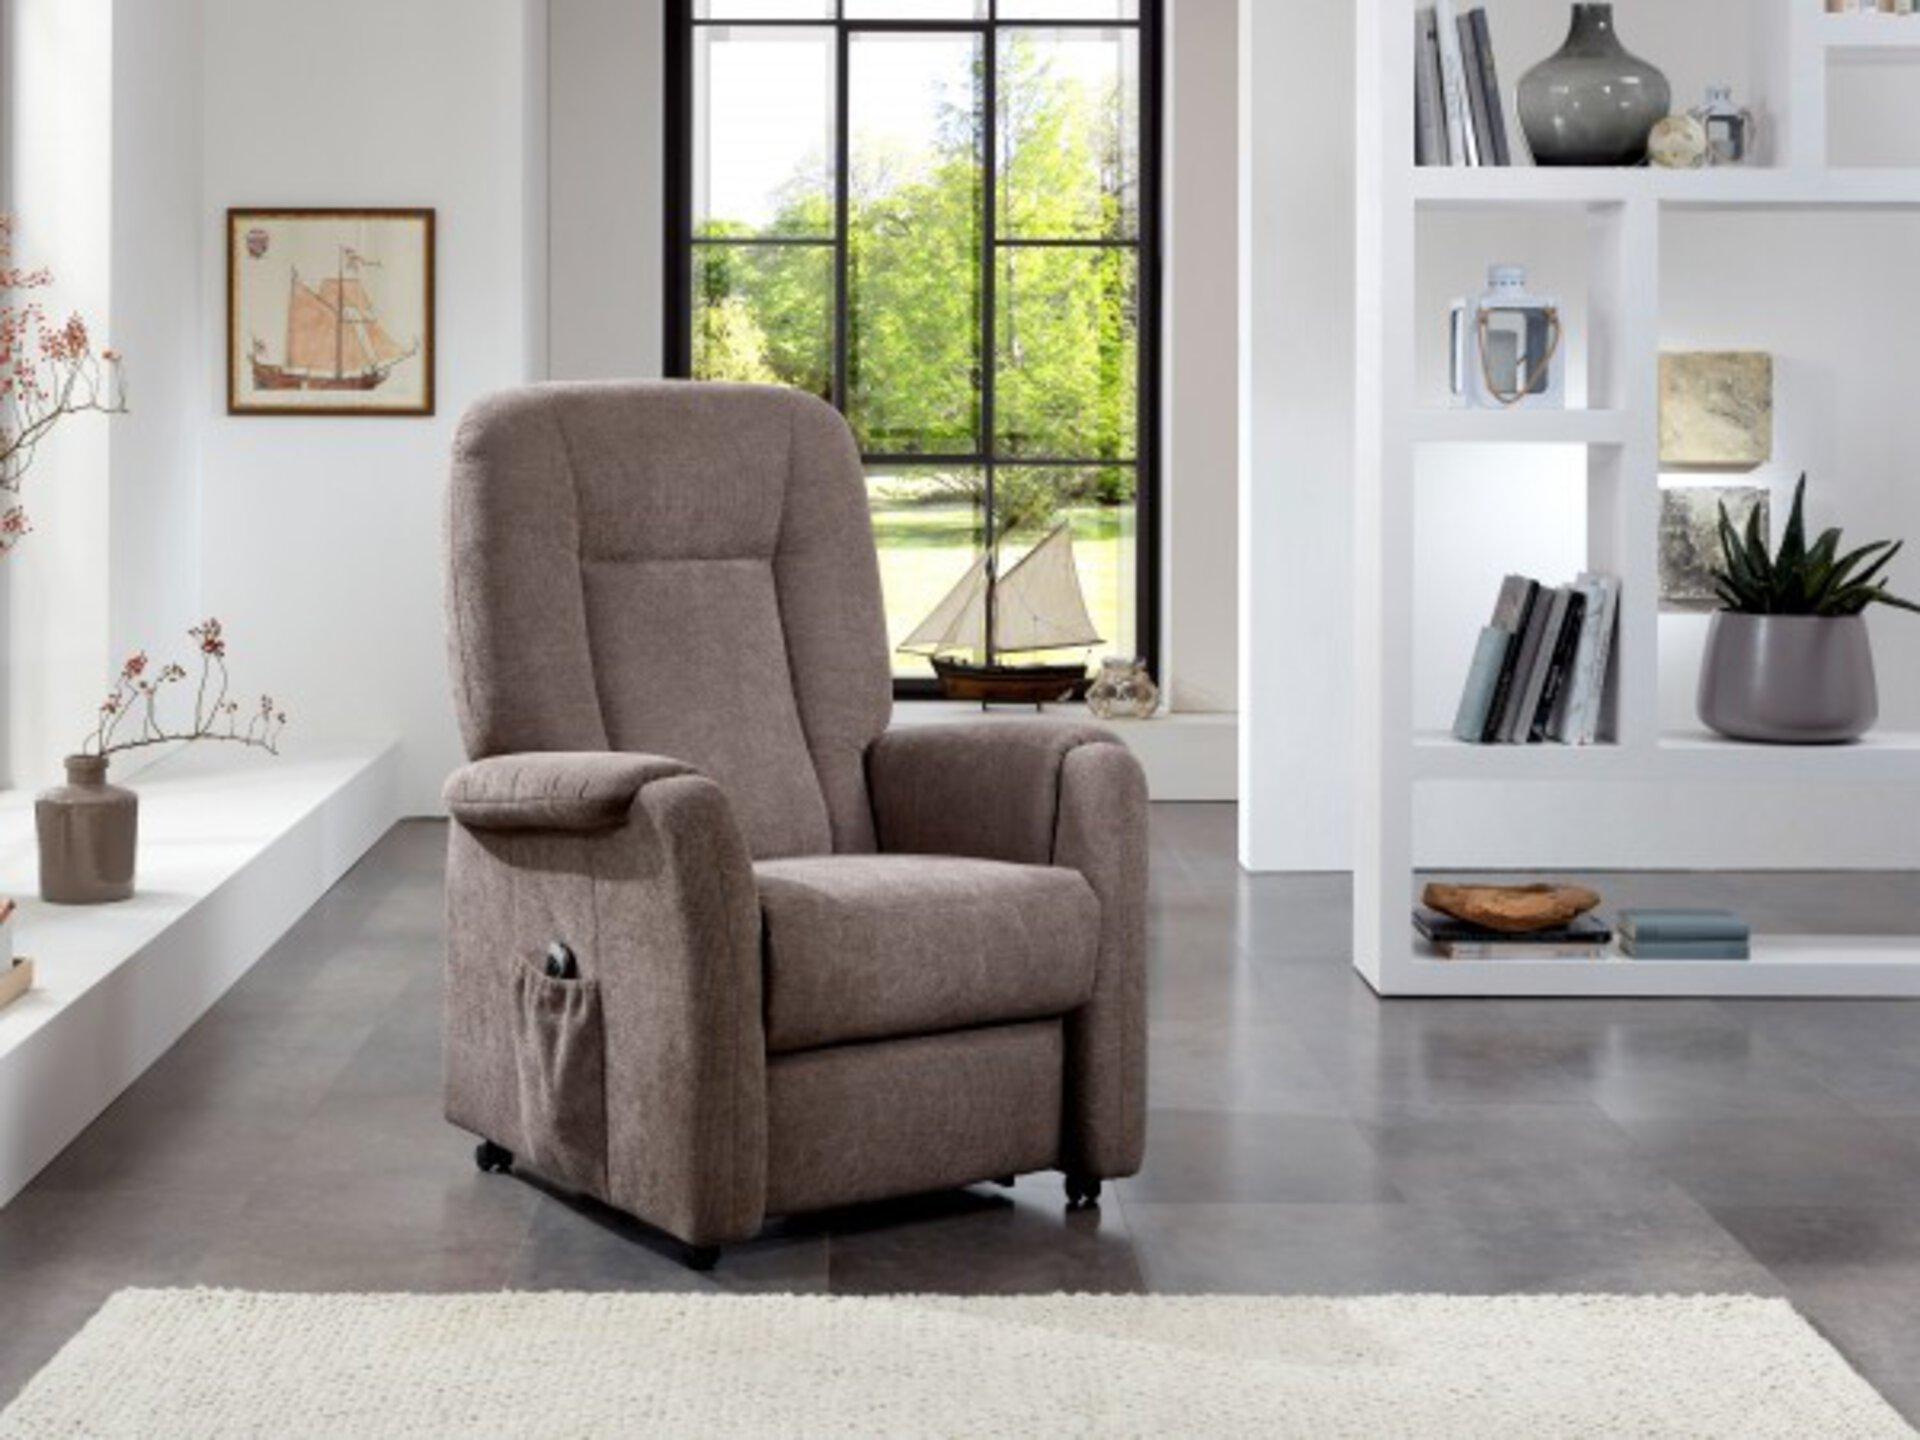 Einzelsessel INTEND LEONIS S BASIC Vito Textil braun 85 x 112 x 86 cm